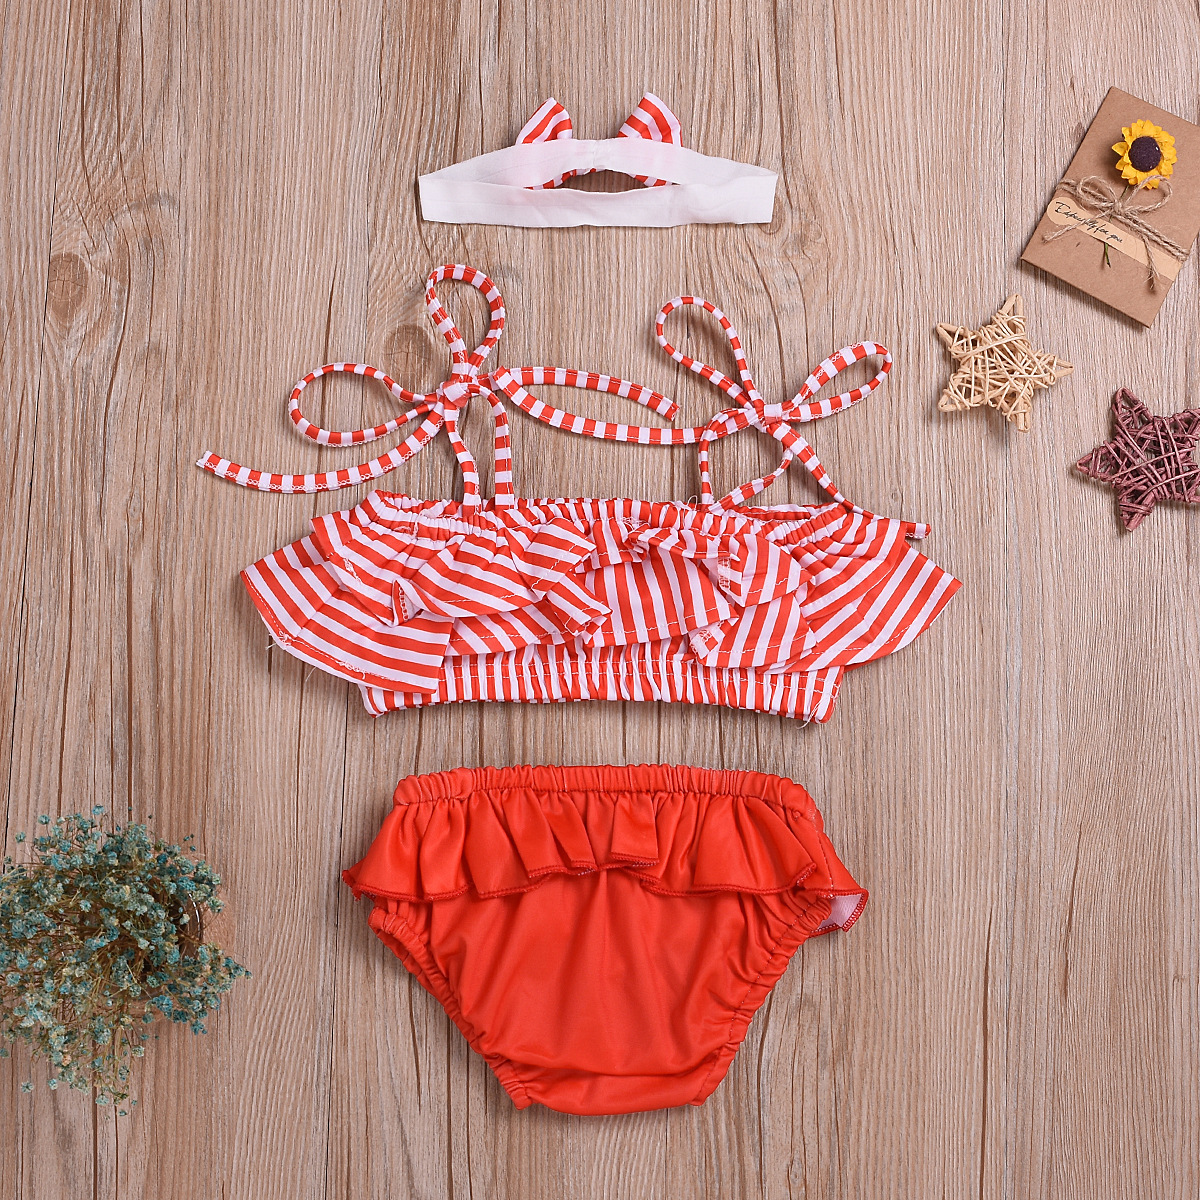 2020 Summer KID'S Swimwear Infants Girls Camisole Stripes Lotus Leaf Mo Xiong Yi Shorts Split Type Swimsuit